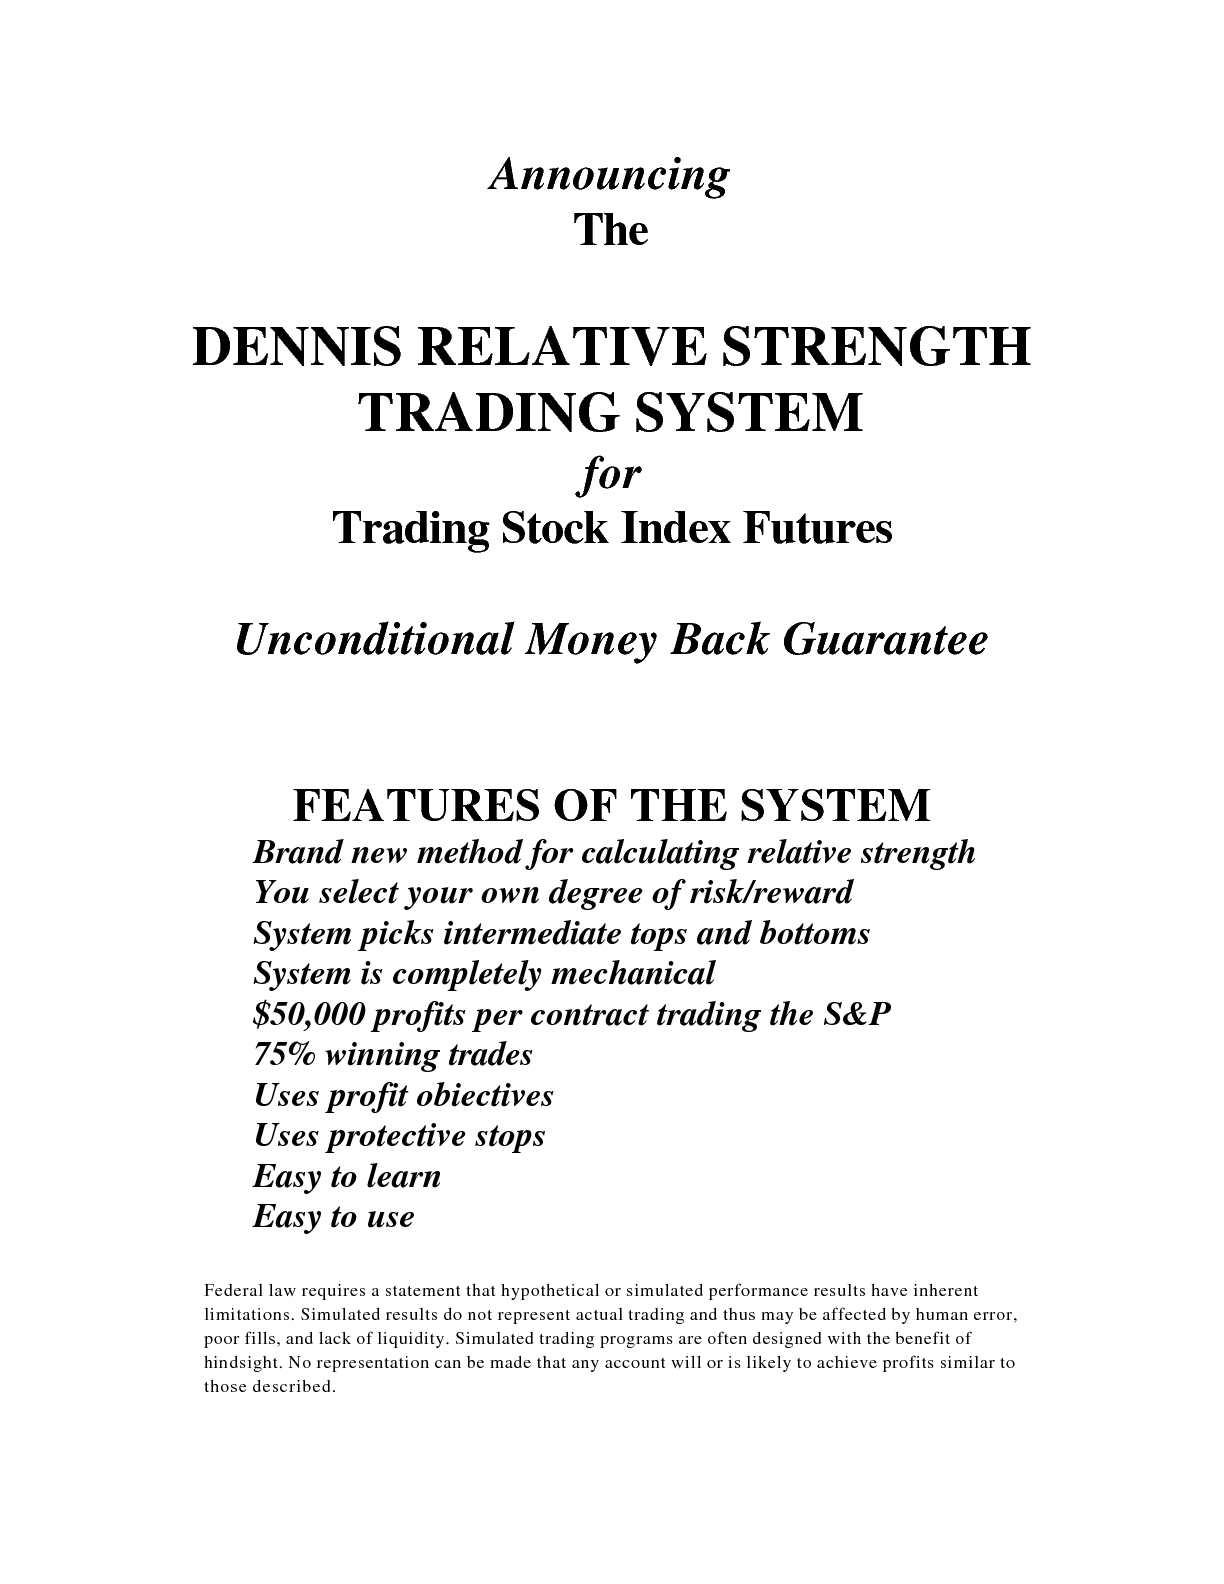 Index future trading system